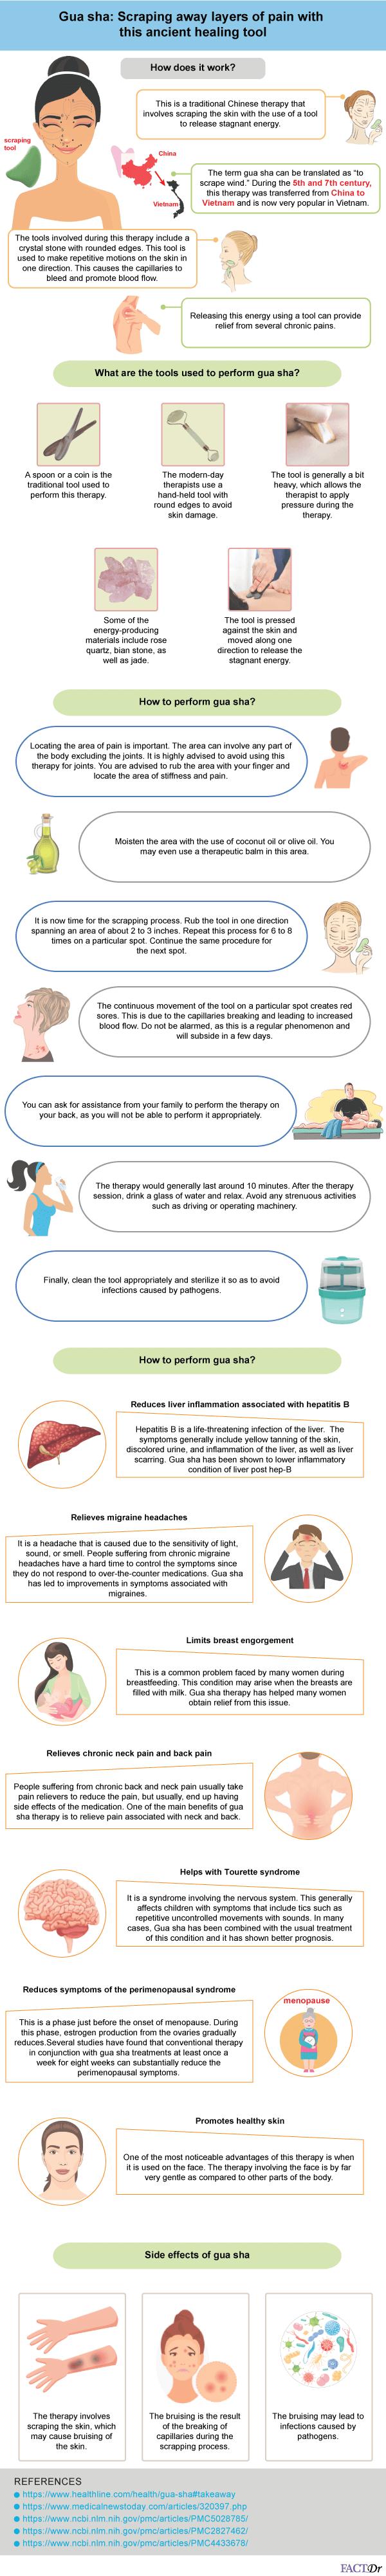 gua sha infographic